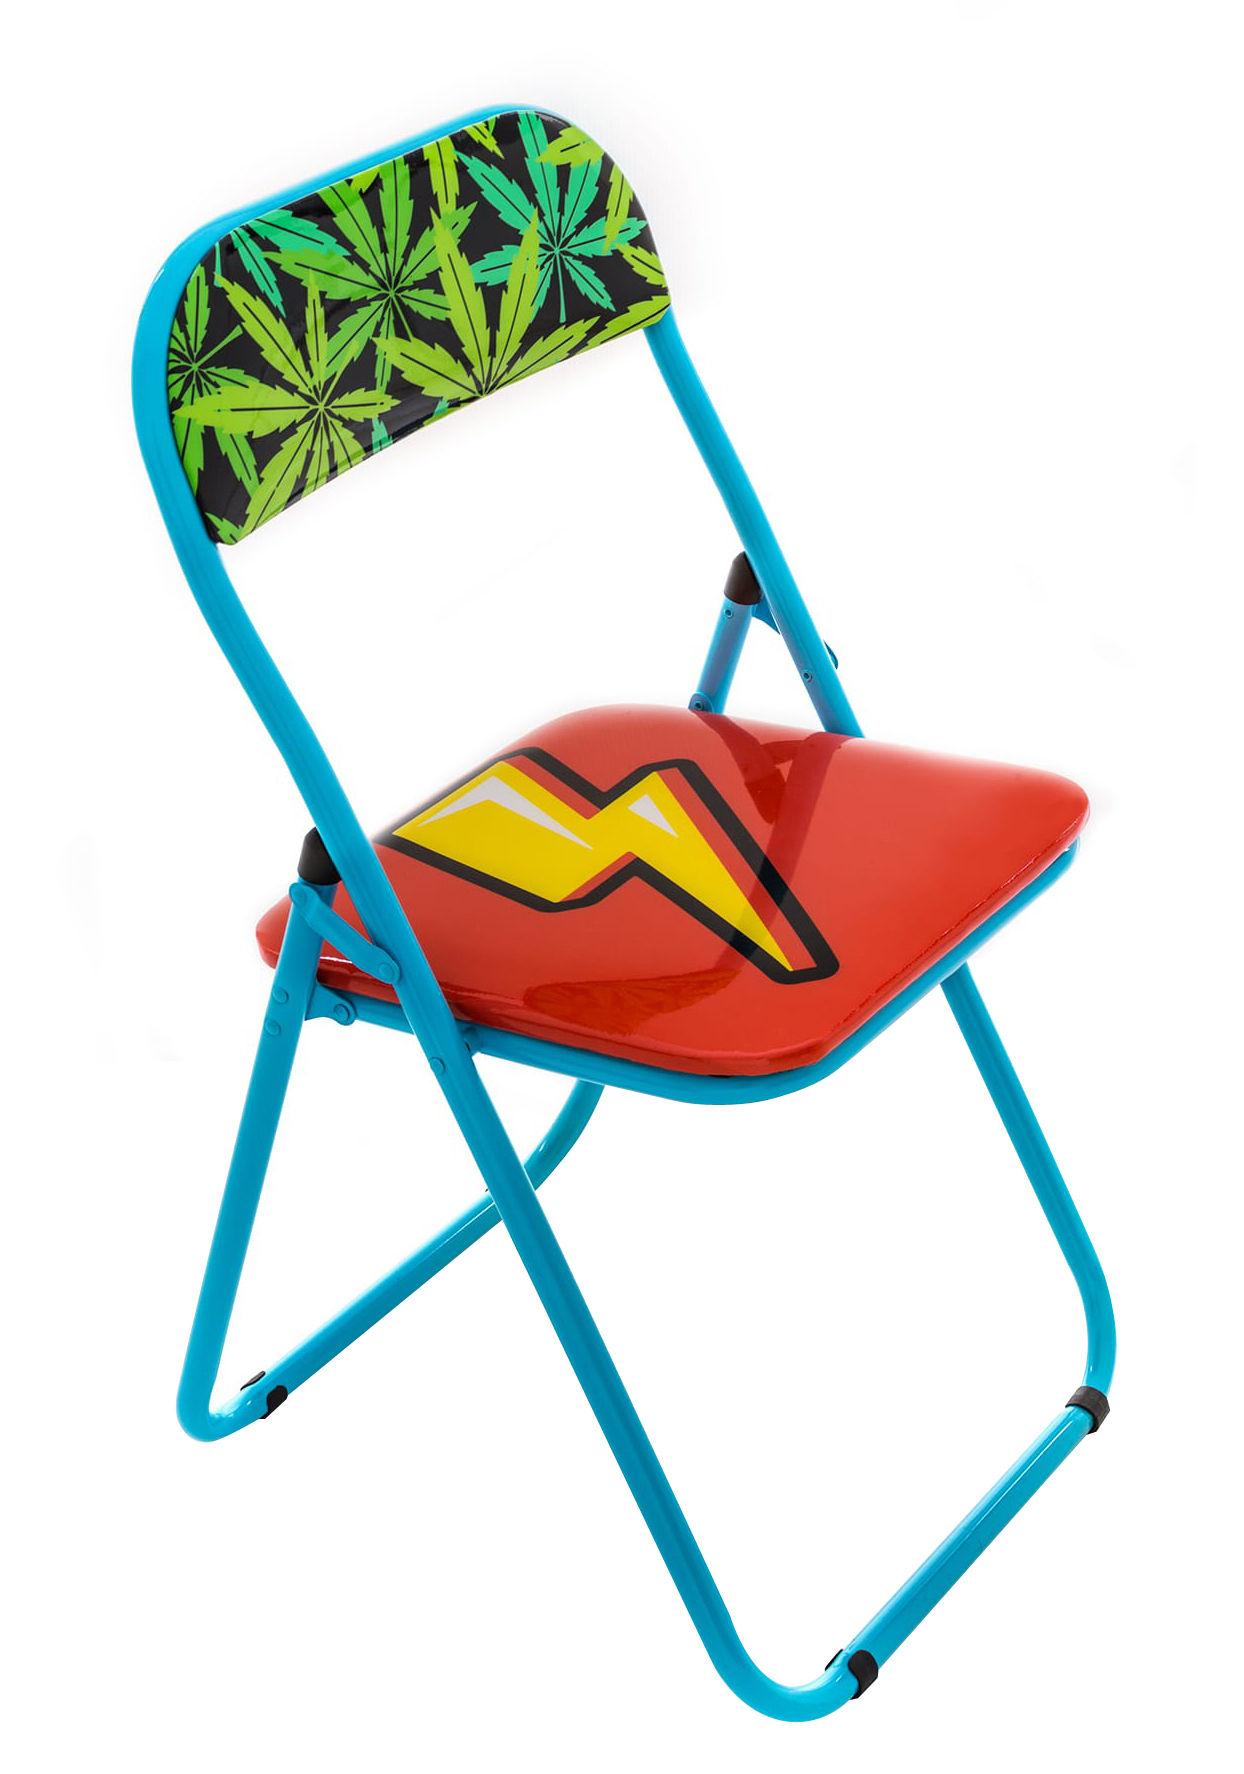 eclair gepolstert seletti klappstuhl. Black Bedroom Furniture Sets. Home Design Ideas